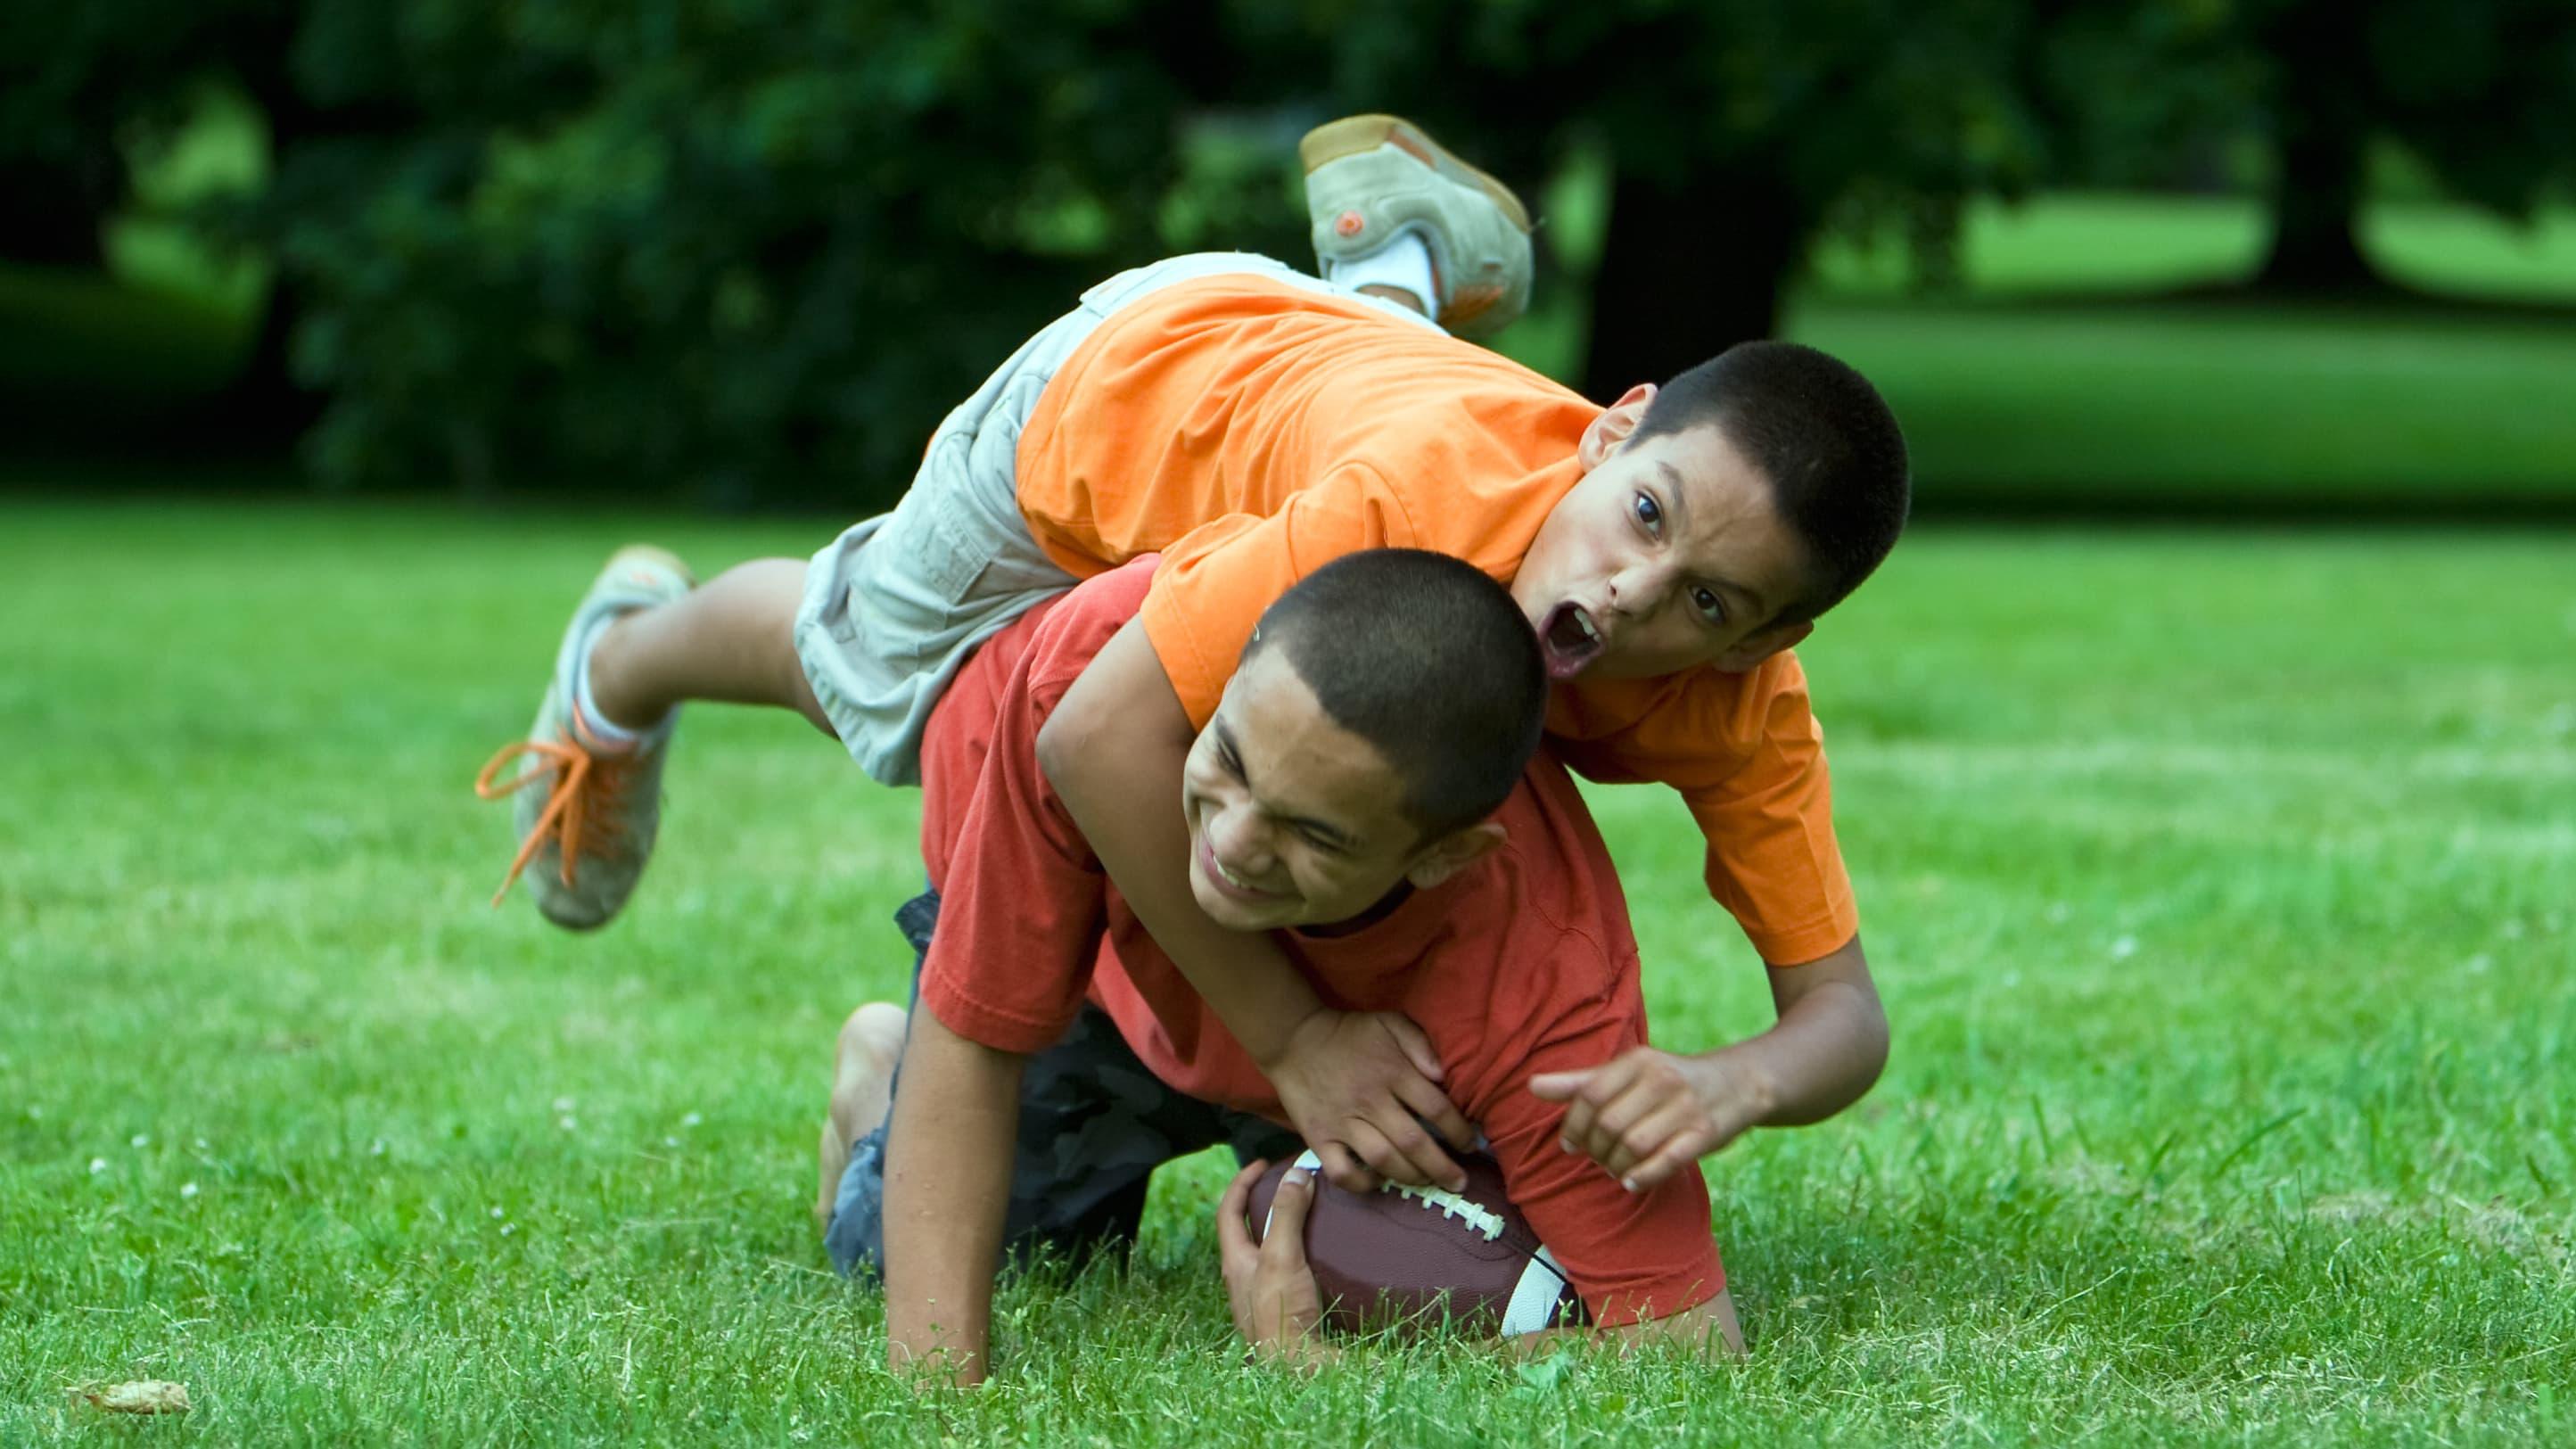 two kids playing football